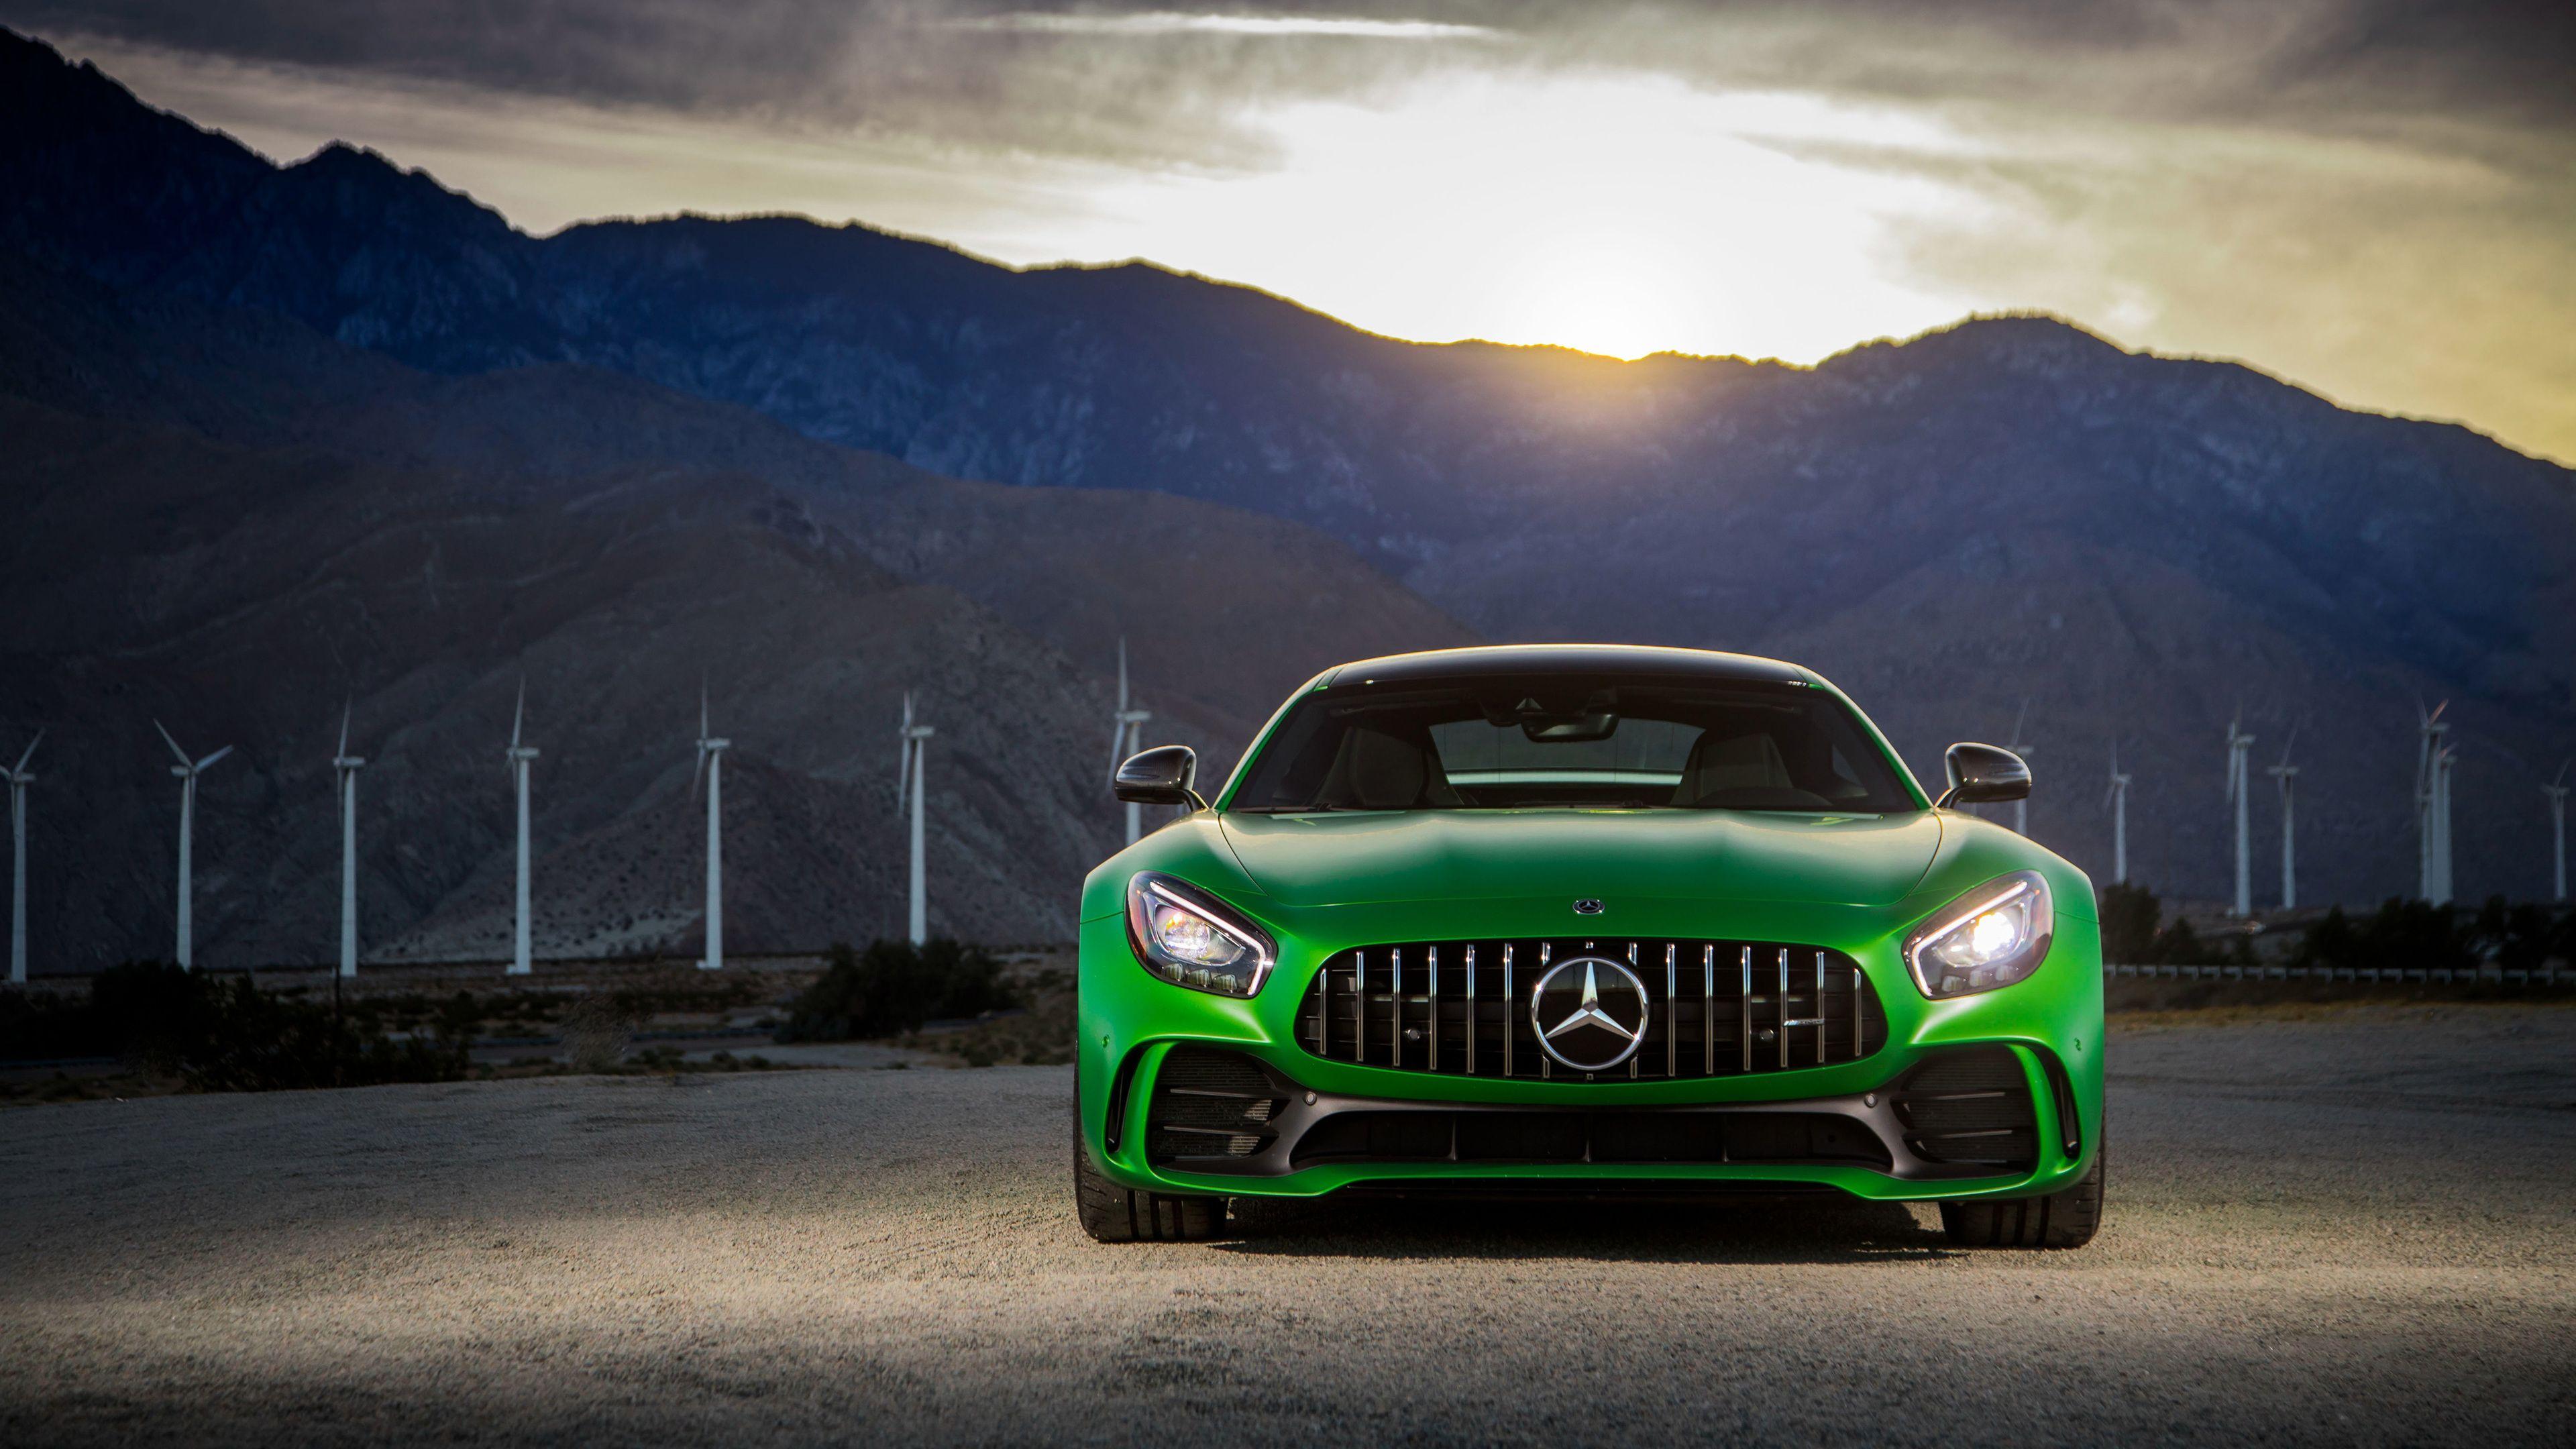 Mercedes Amg Gt R 2018 Mercedes Wallpapers Mercedes Amg Gtr